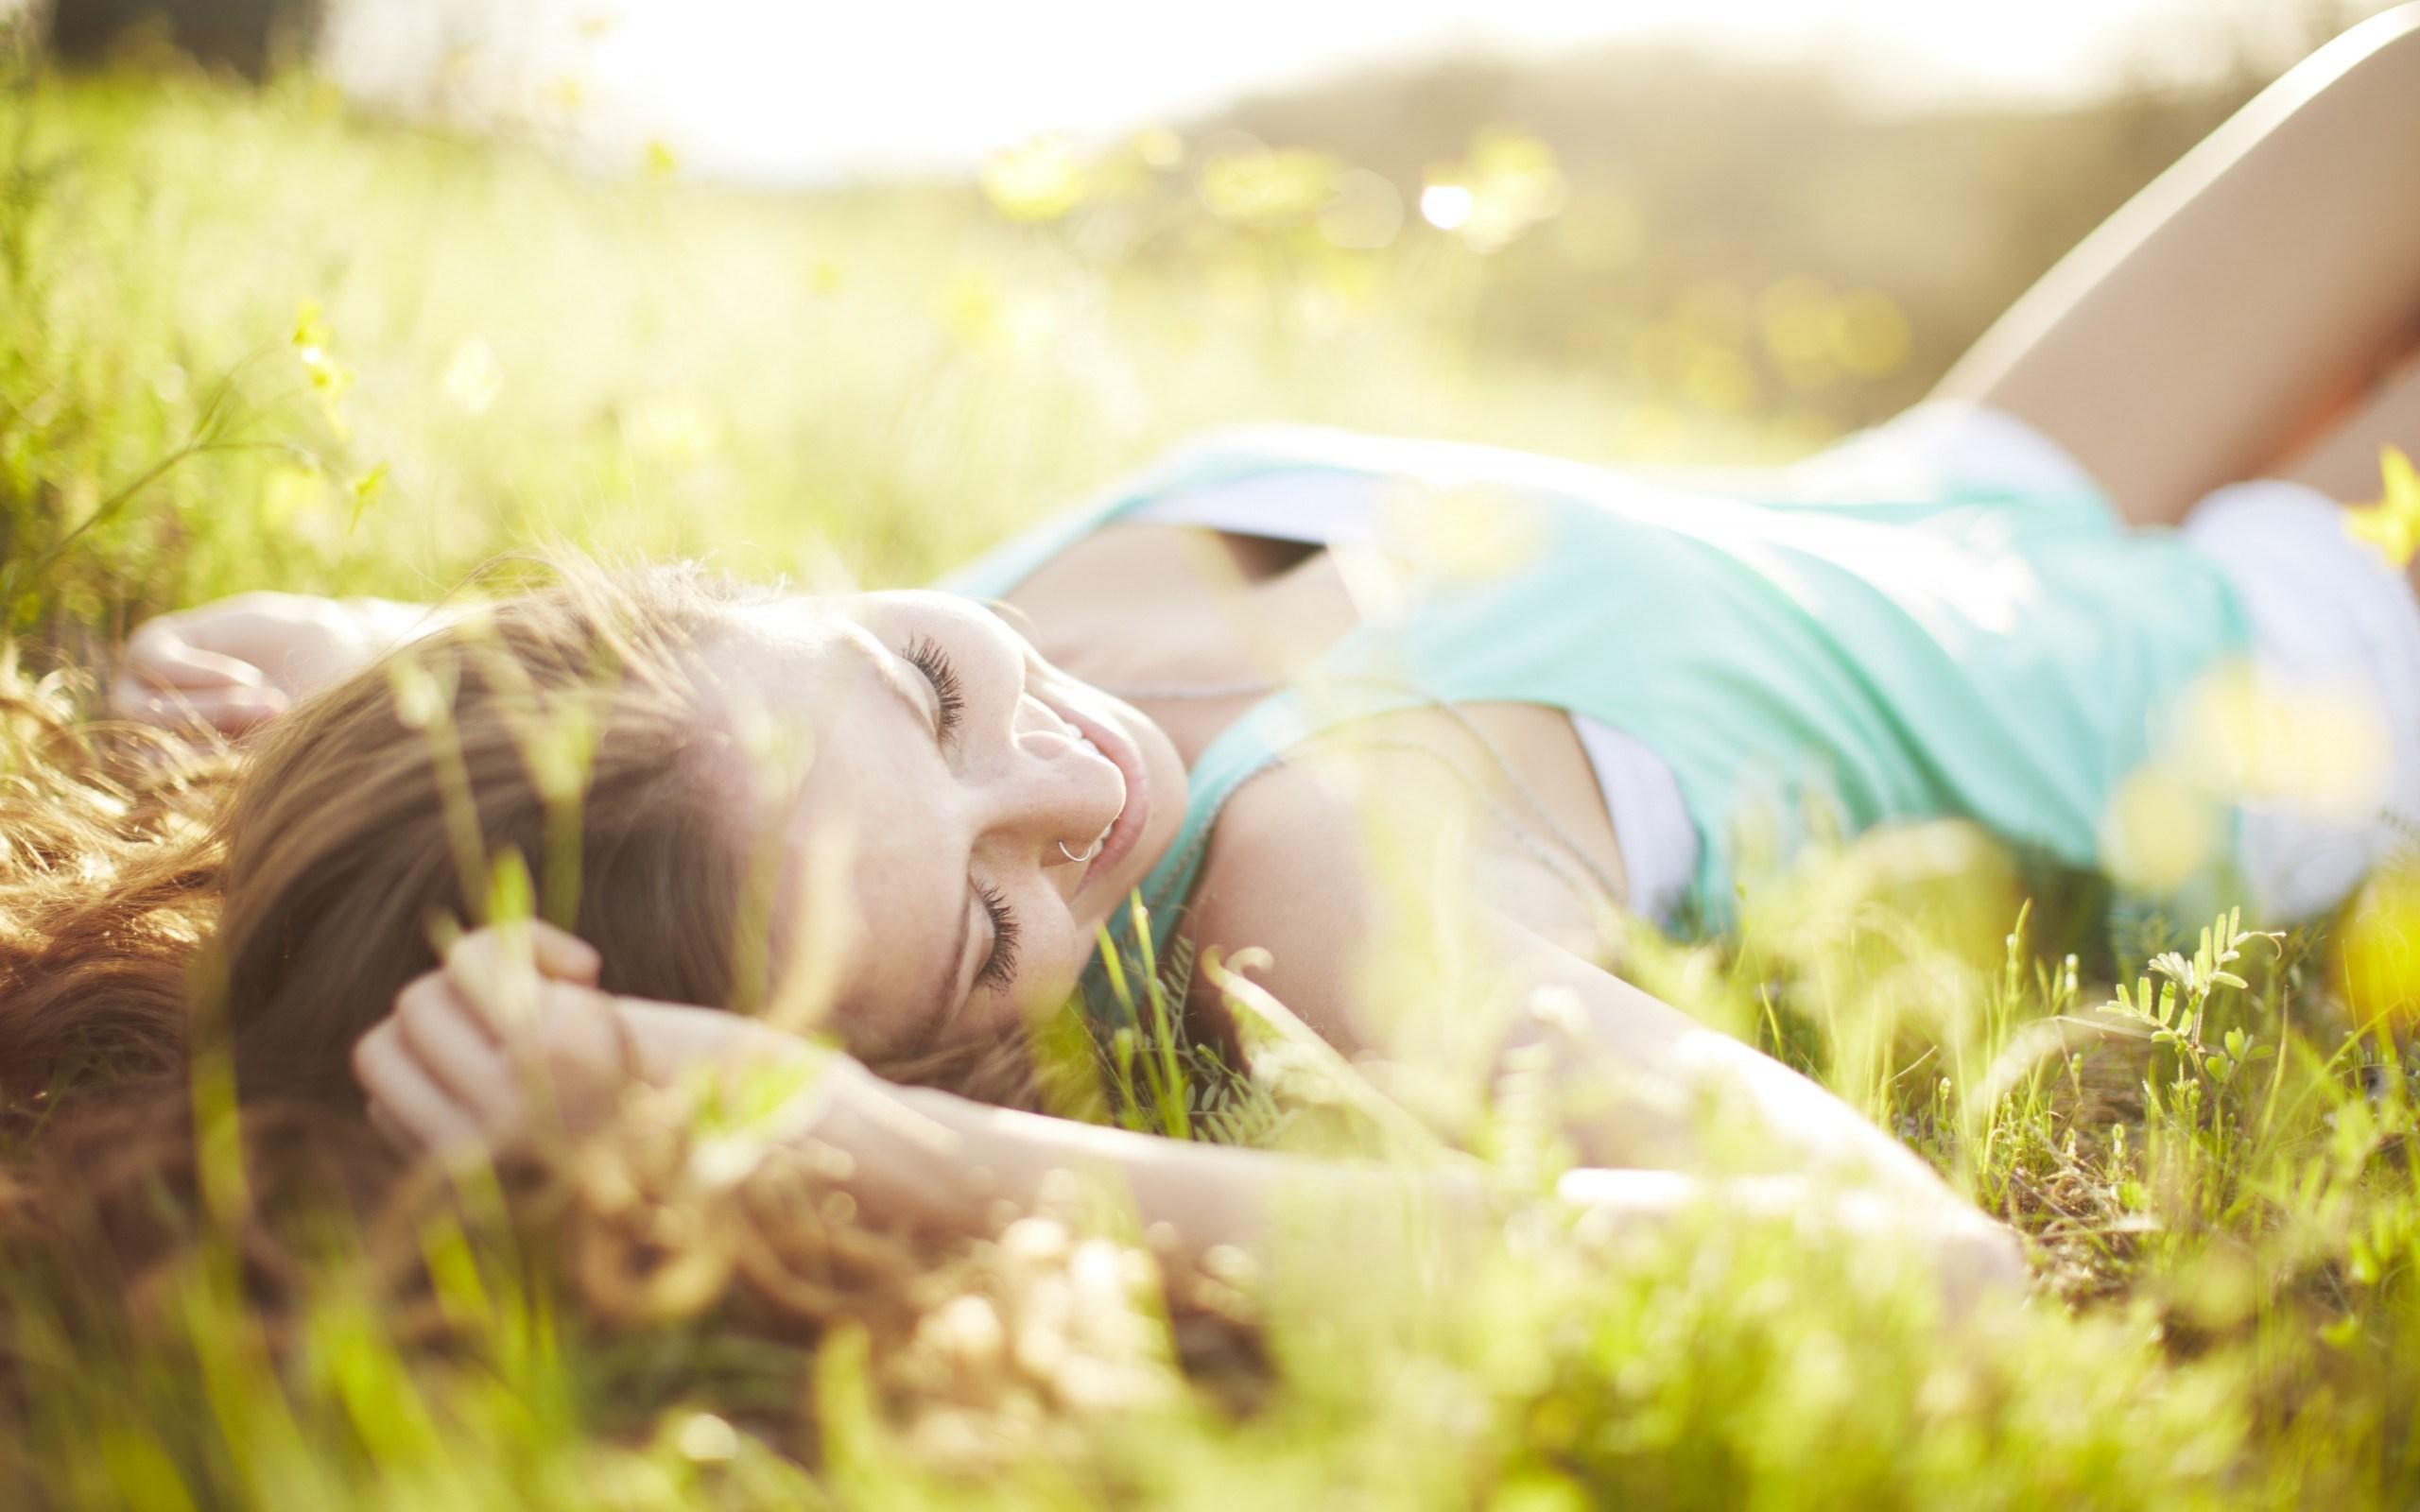 Девушка в траве  № 559796 бесплатно